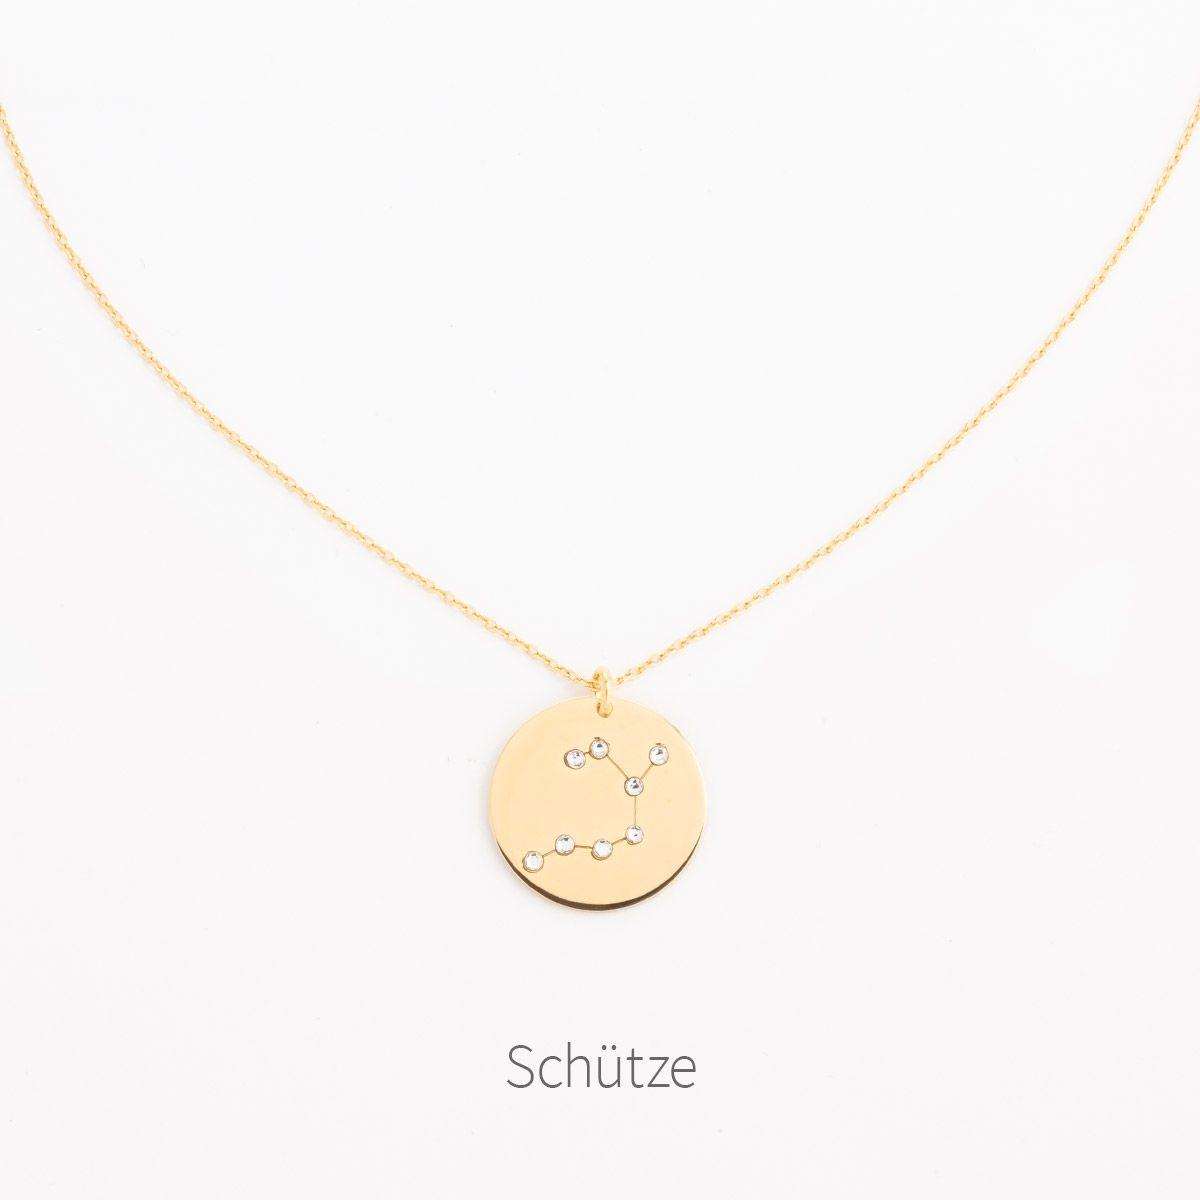 Svea - Halsketten - 18k vergoldet